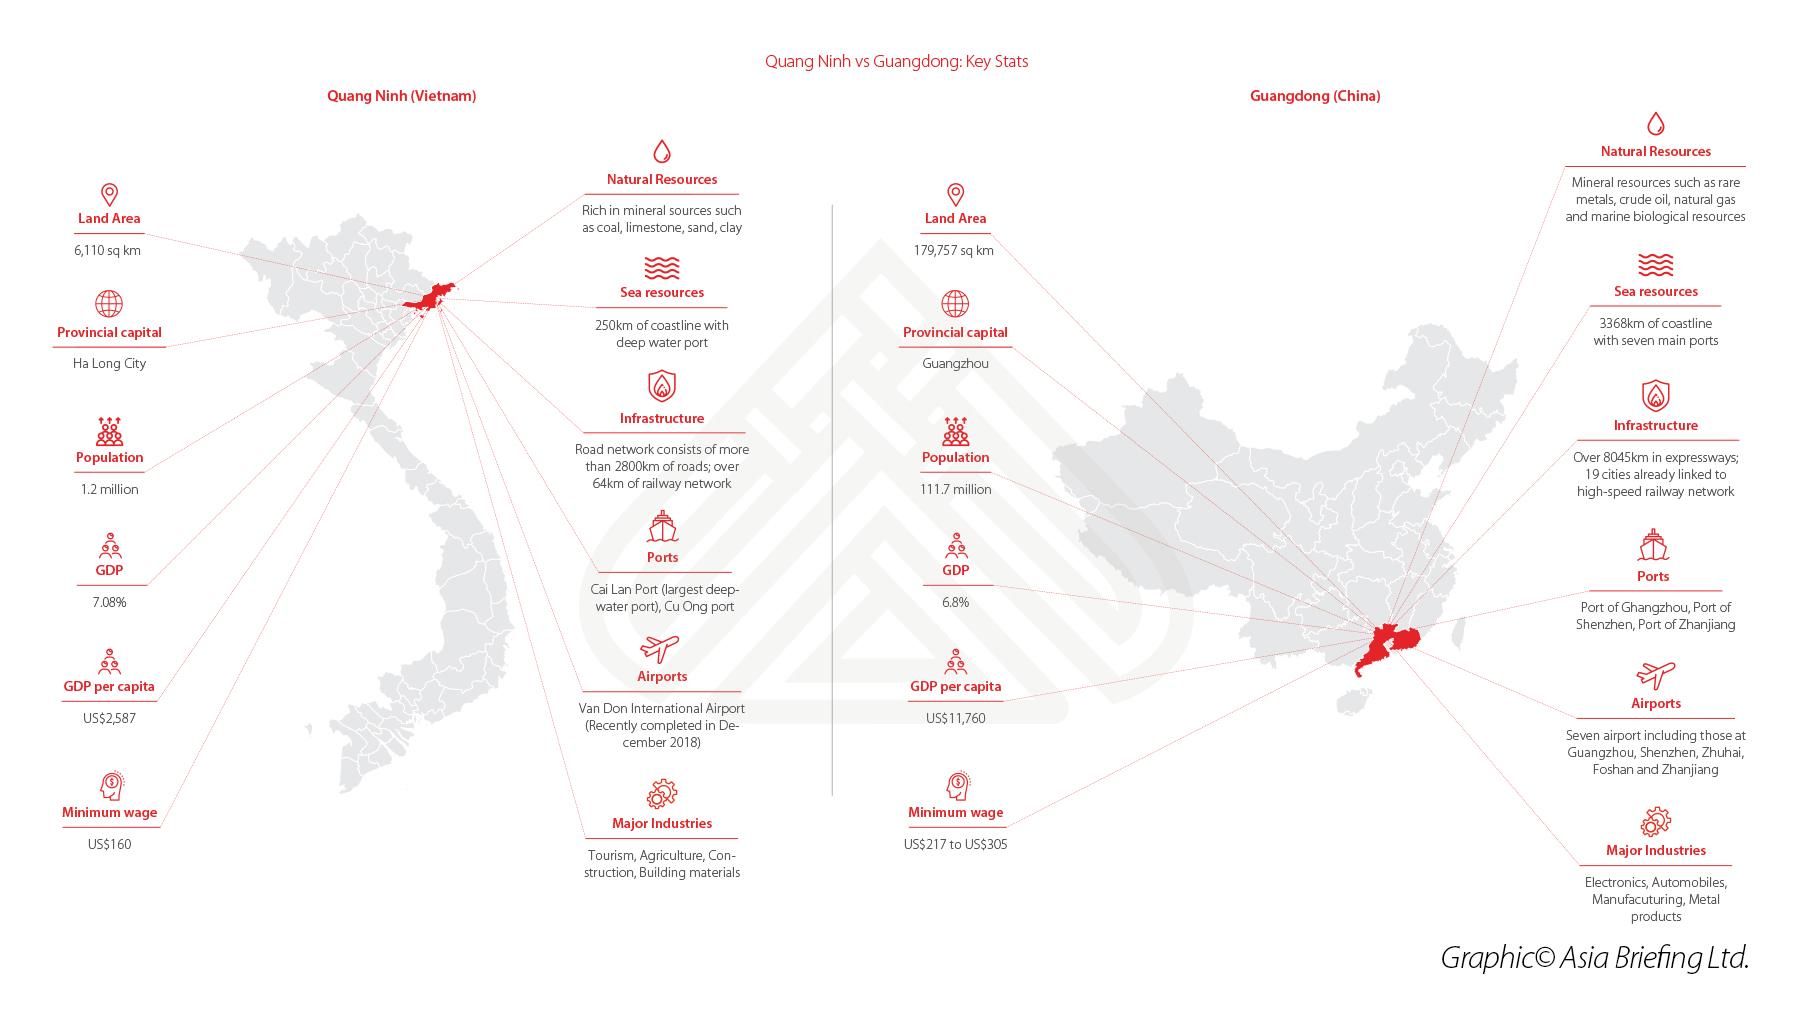 Quang Ninh and Guangdong